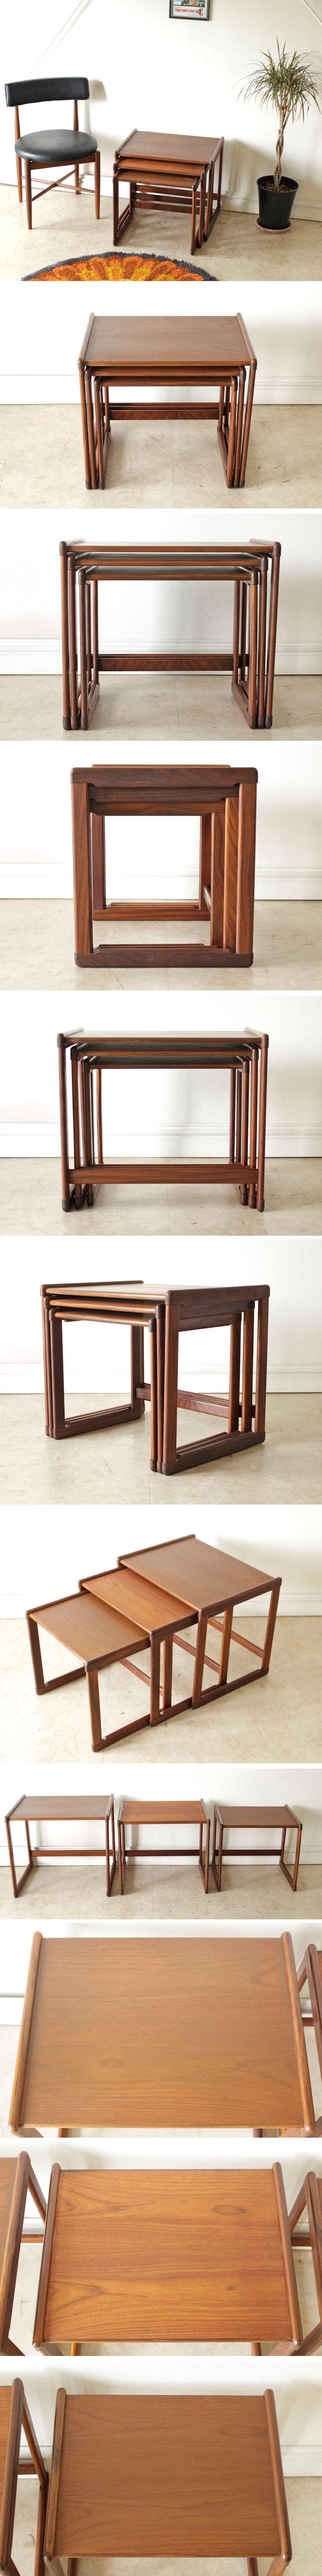 G-plan・ジープラン・ネストテーブル・コーヒーテーブル・チーク・ビンテージ・アンティーク・北欧